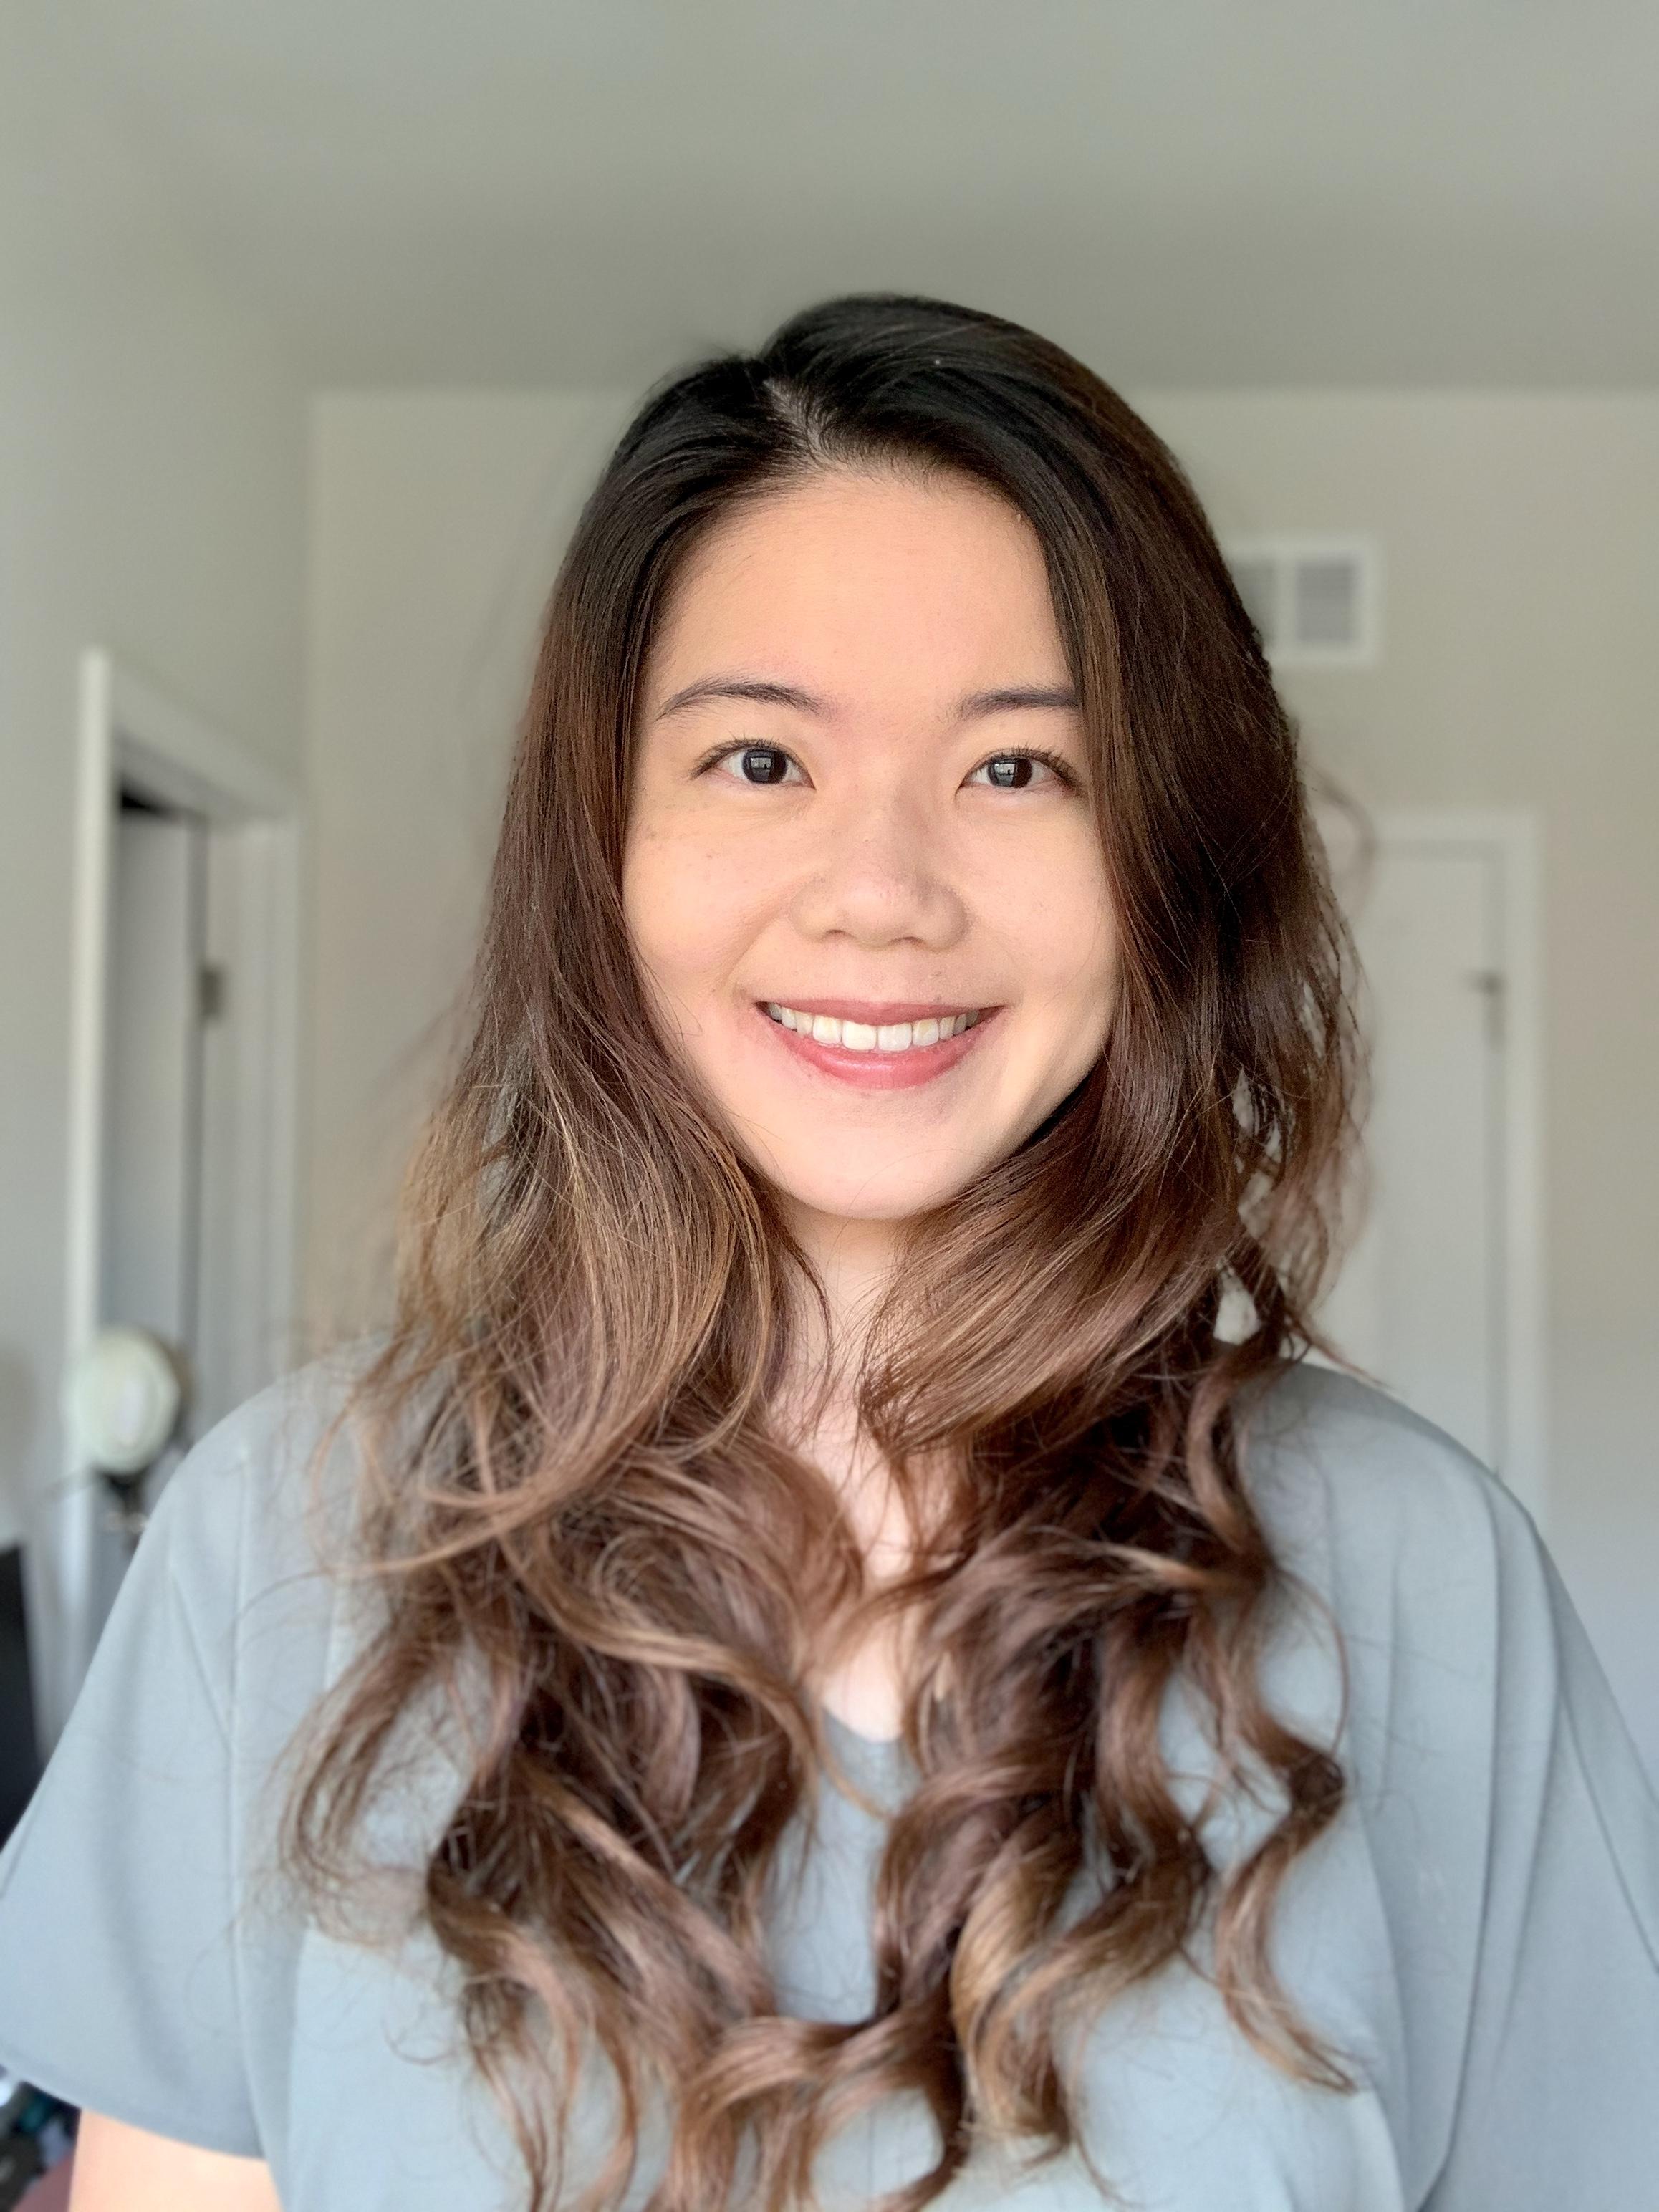 Hsiang-Yun Sherry Chien